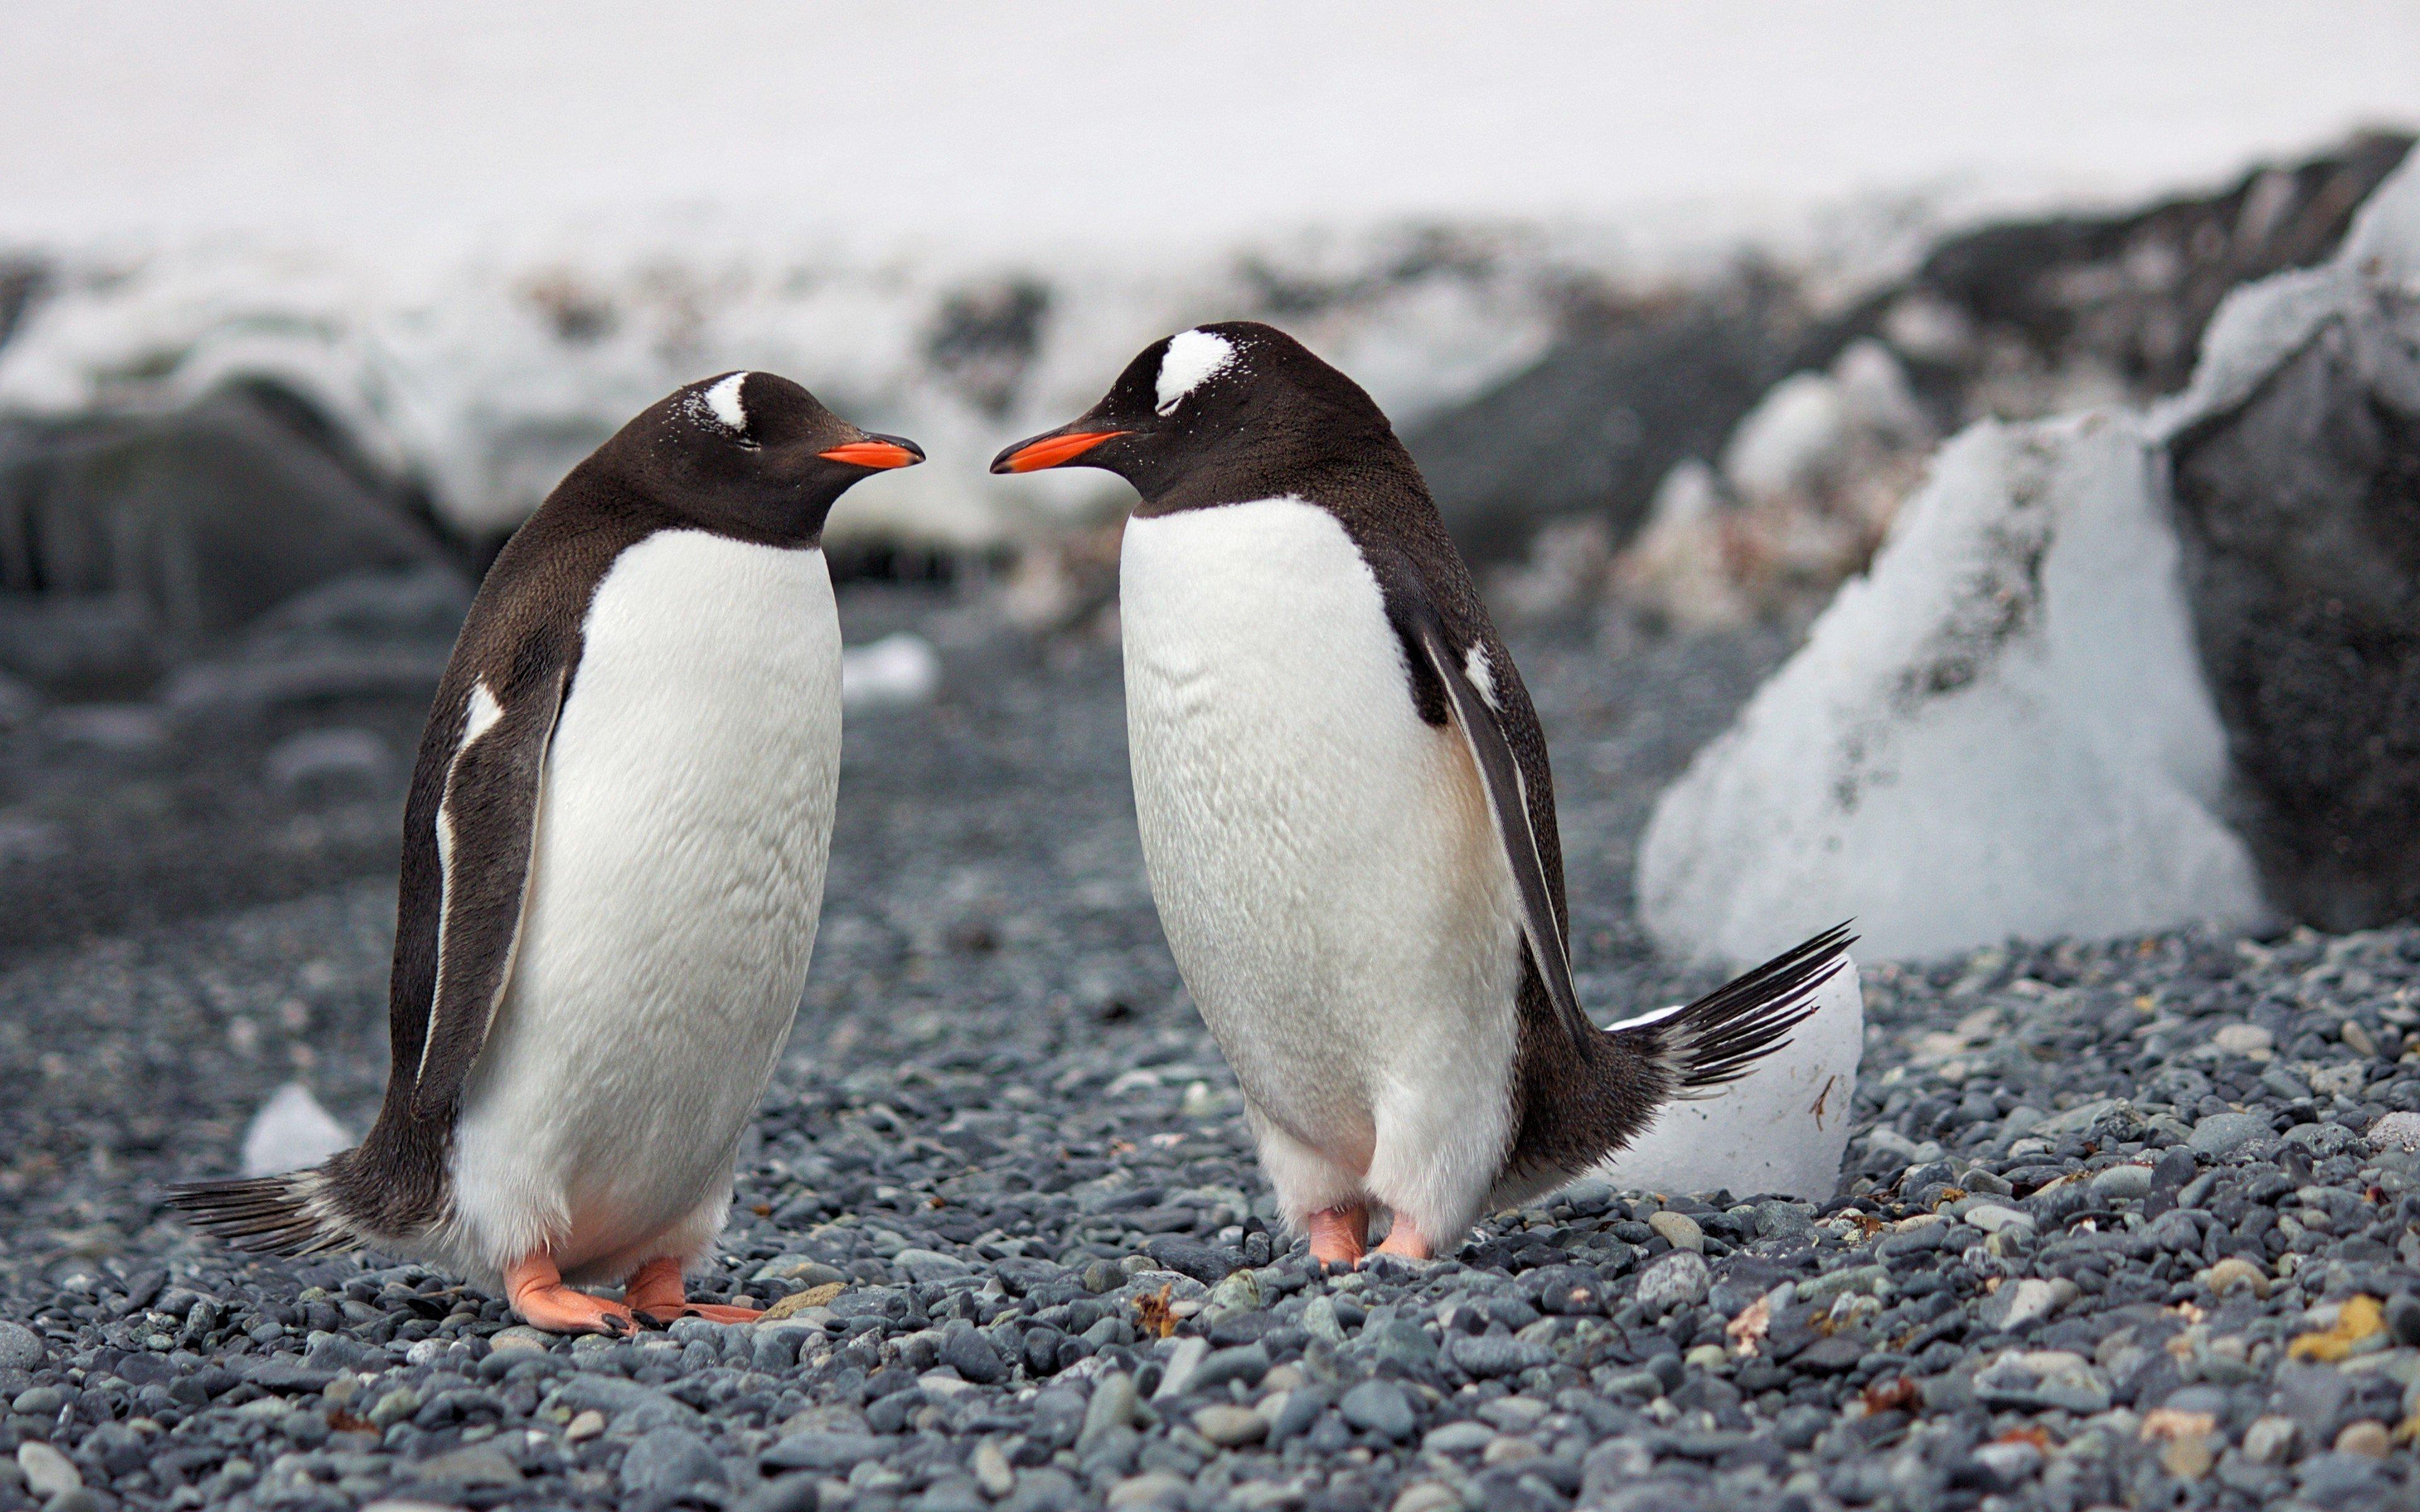 Wallpaper Two penguins